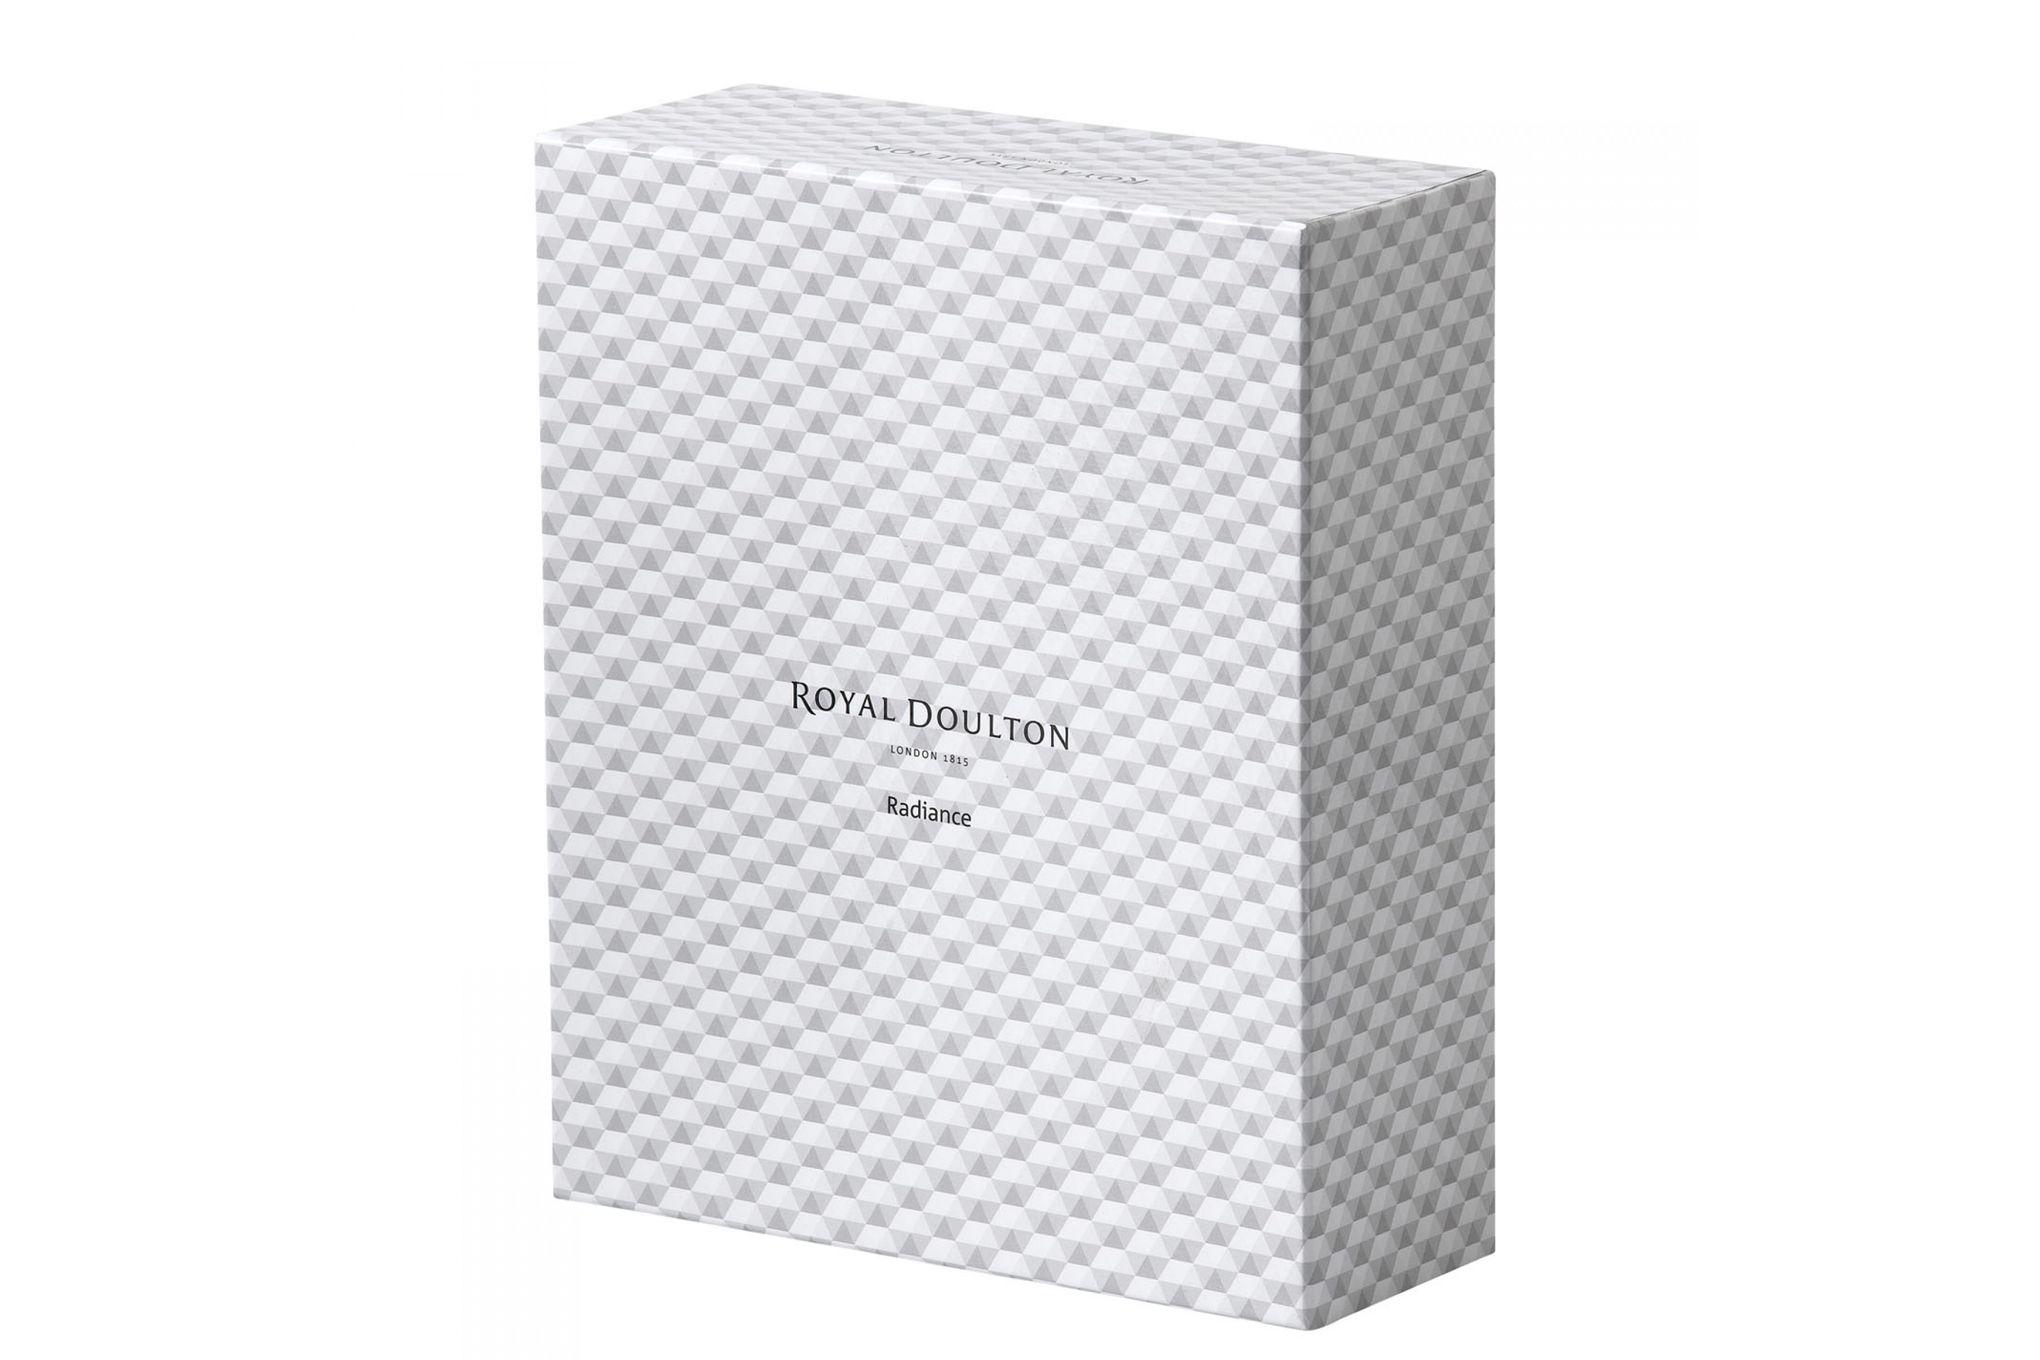 "Royal Doulton Radiance Diamond Photo Frame Boxed 7 x 5"" thumb 3"